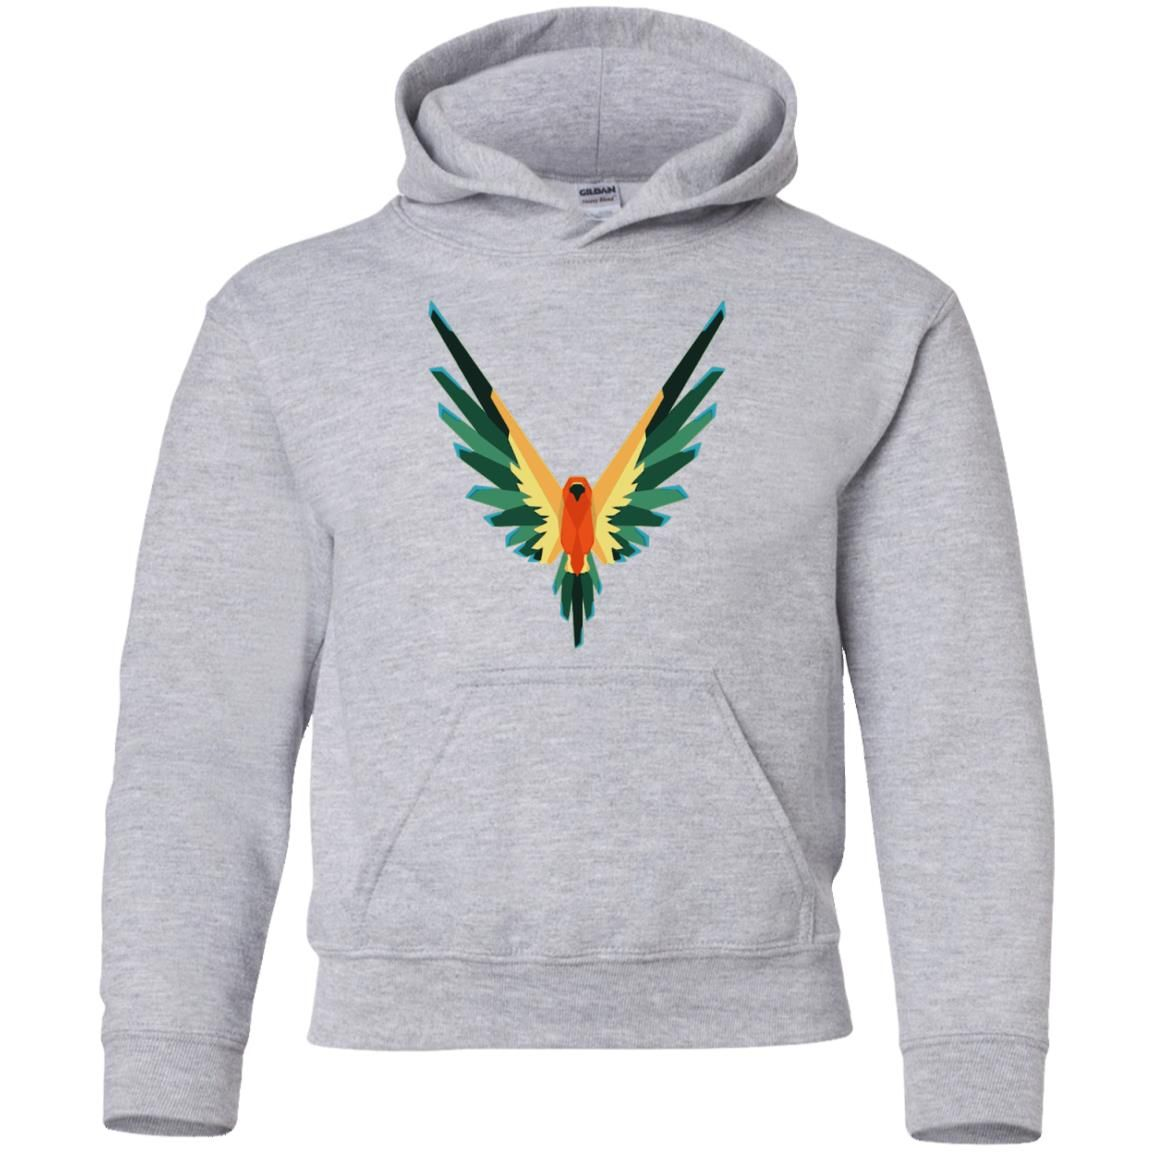 image 1232 - Logan Paul Maverick kid shirt & sweatshirt